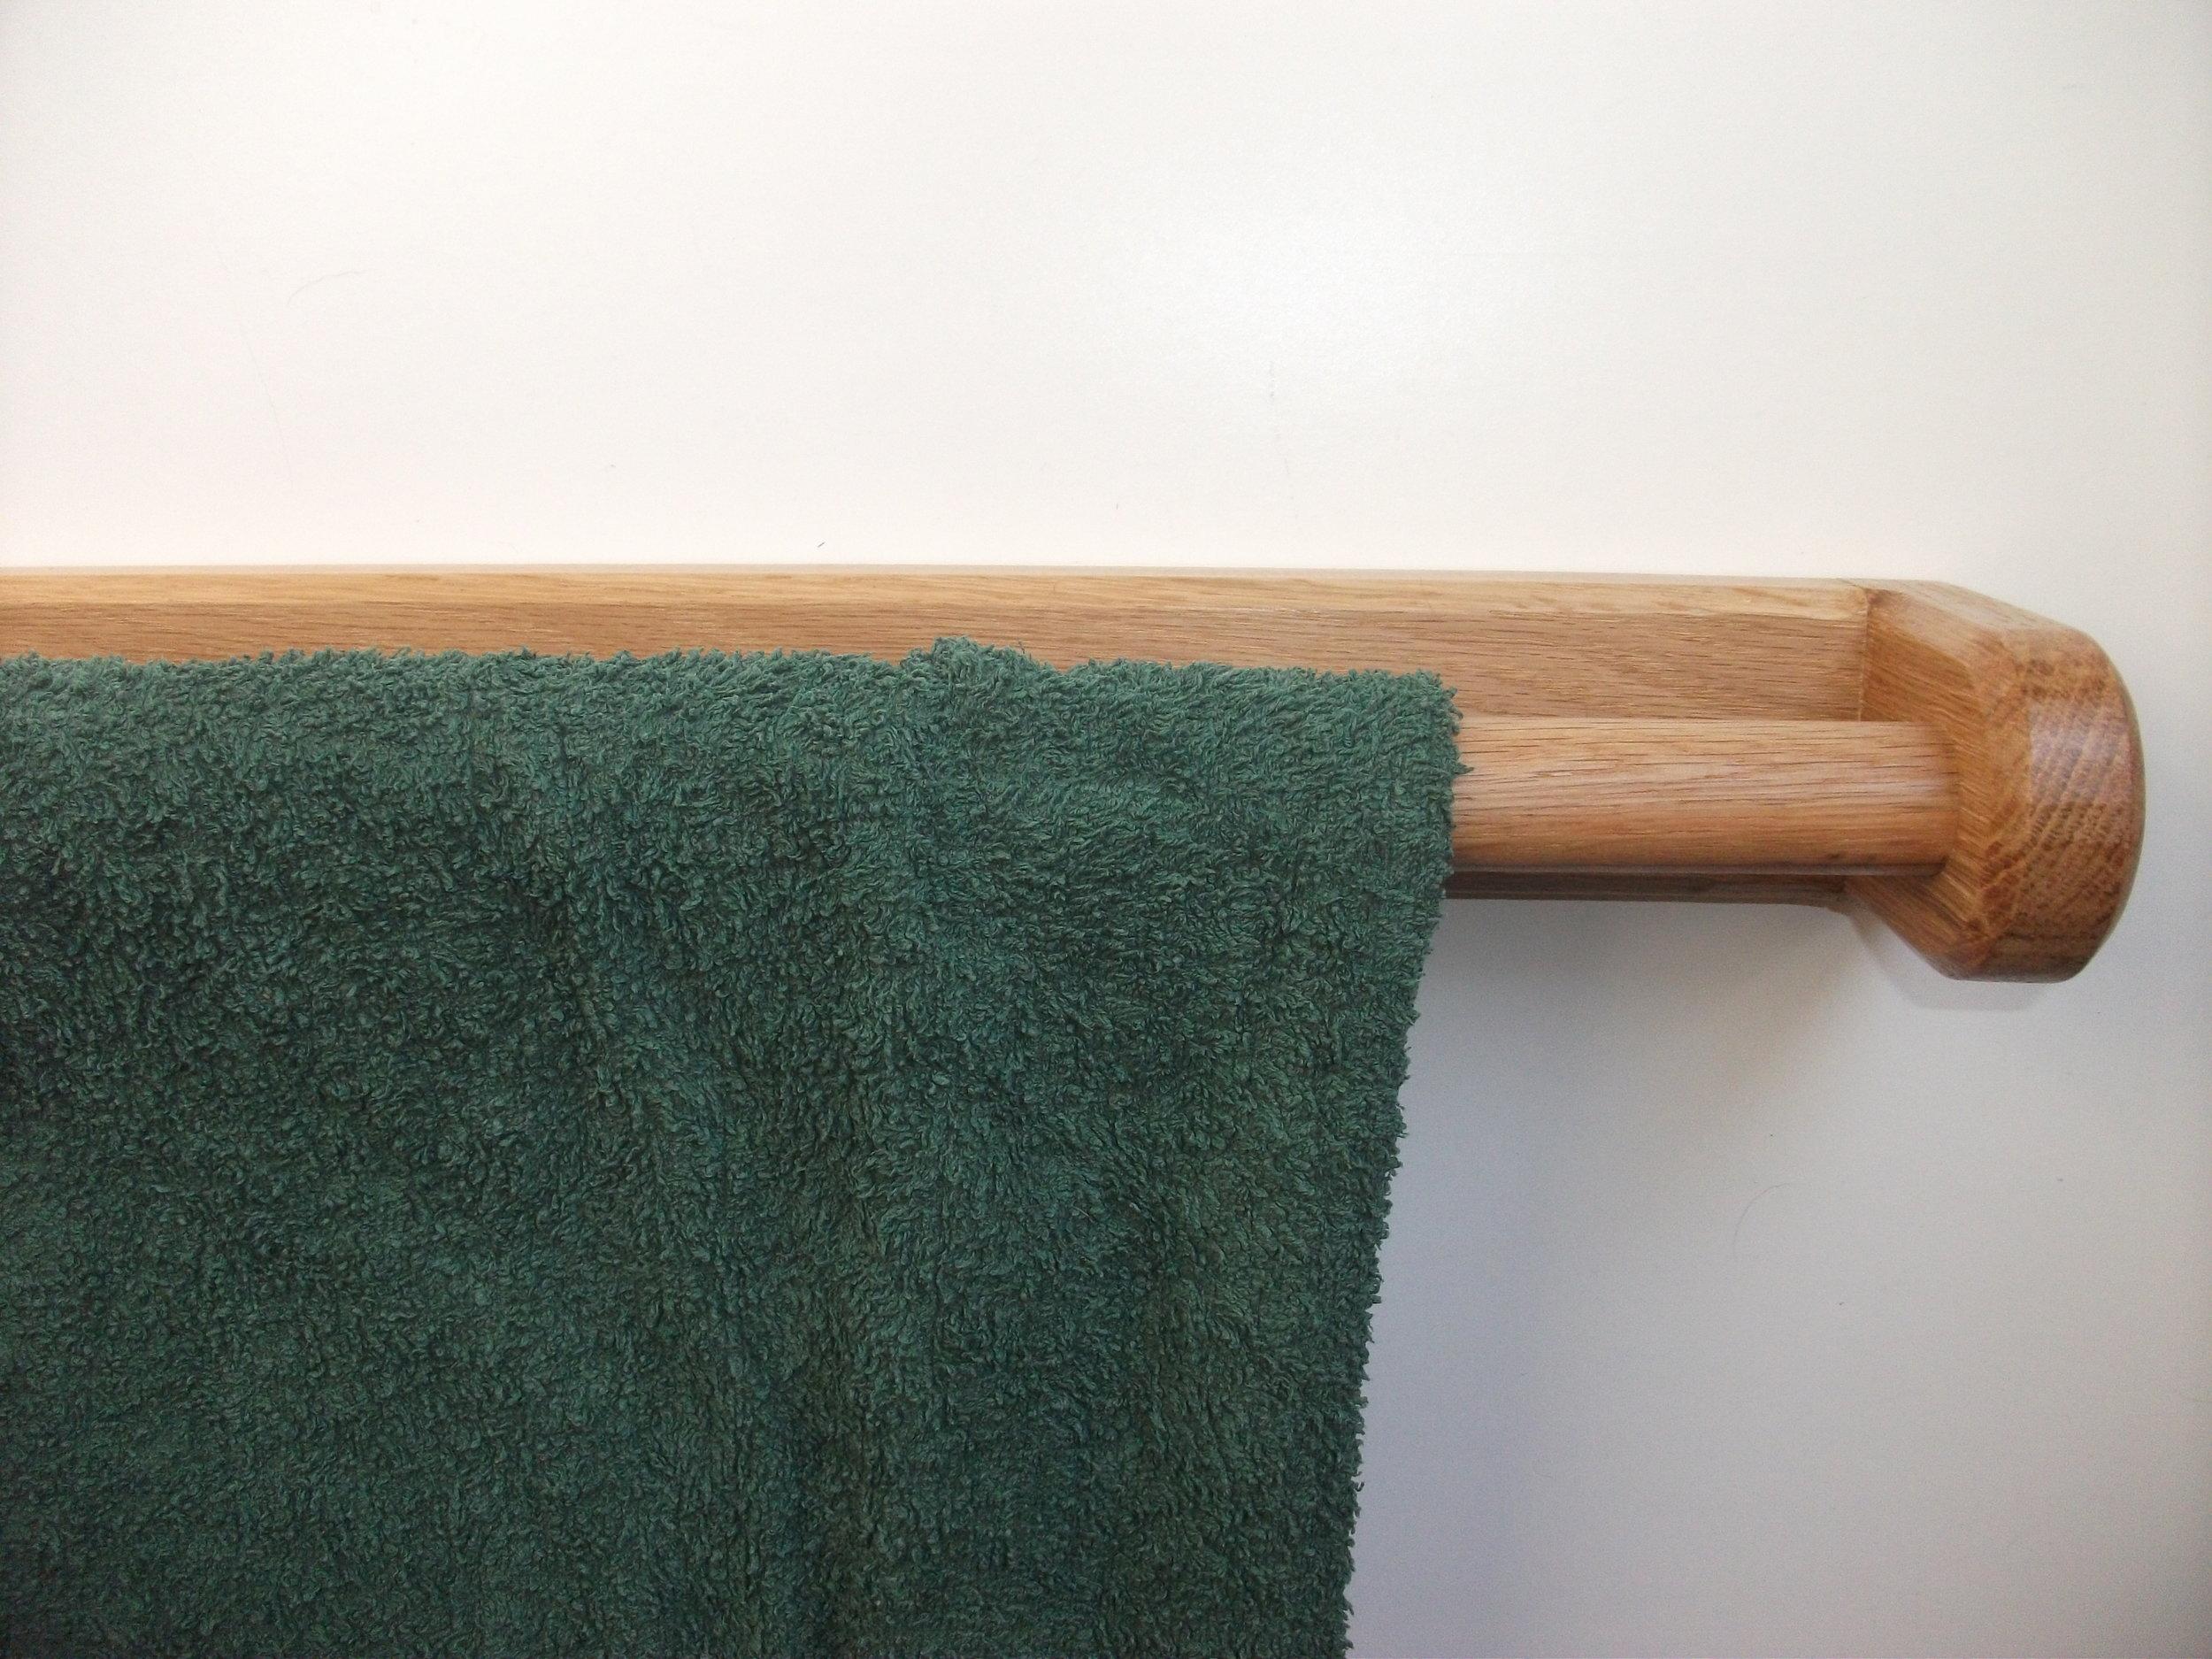 Oak towel demo 1.JPG